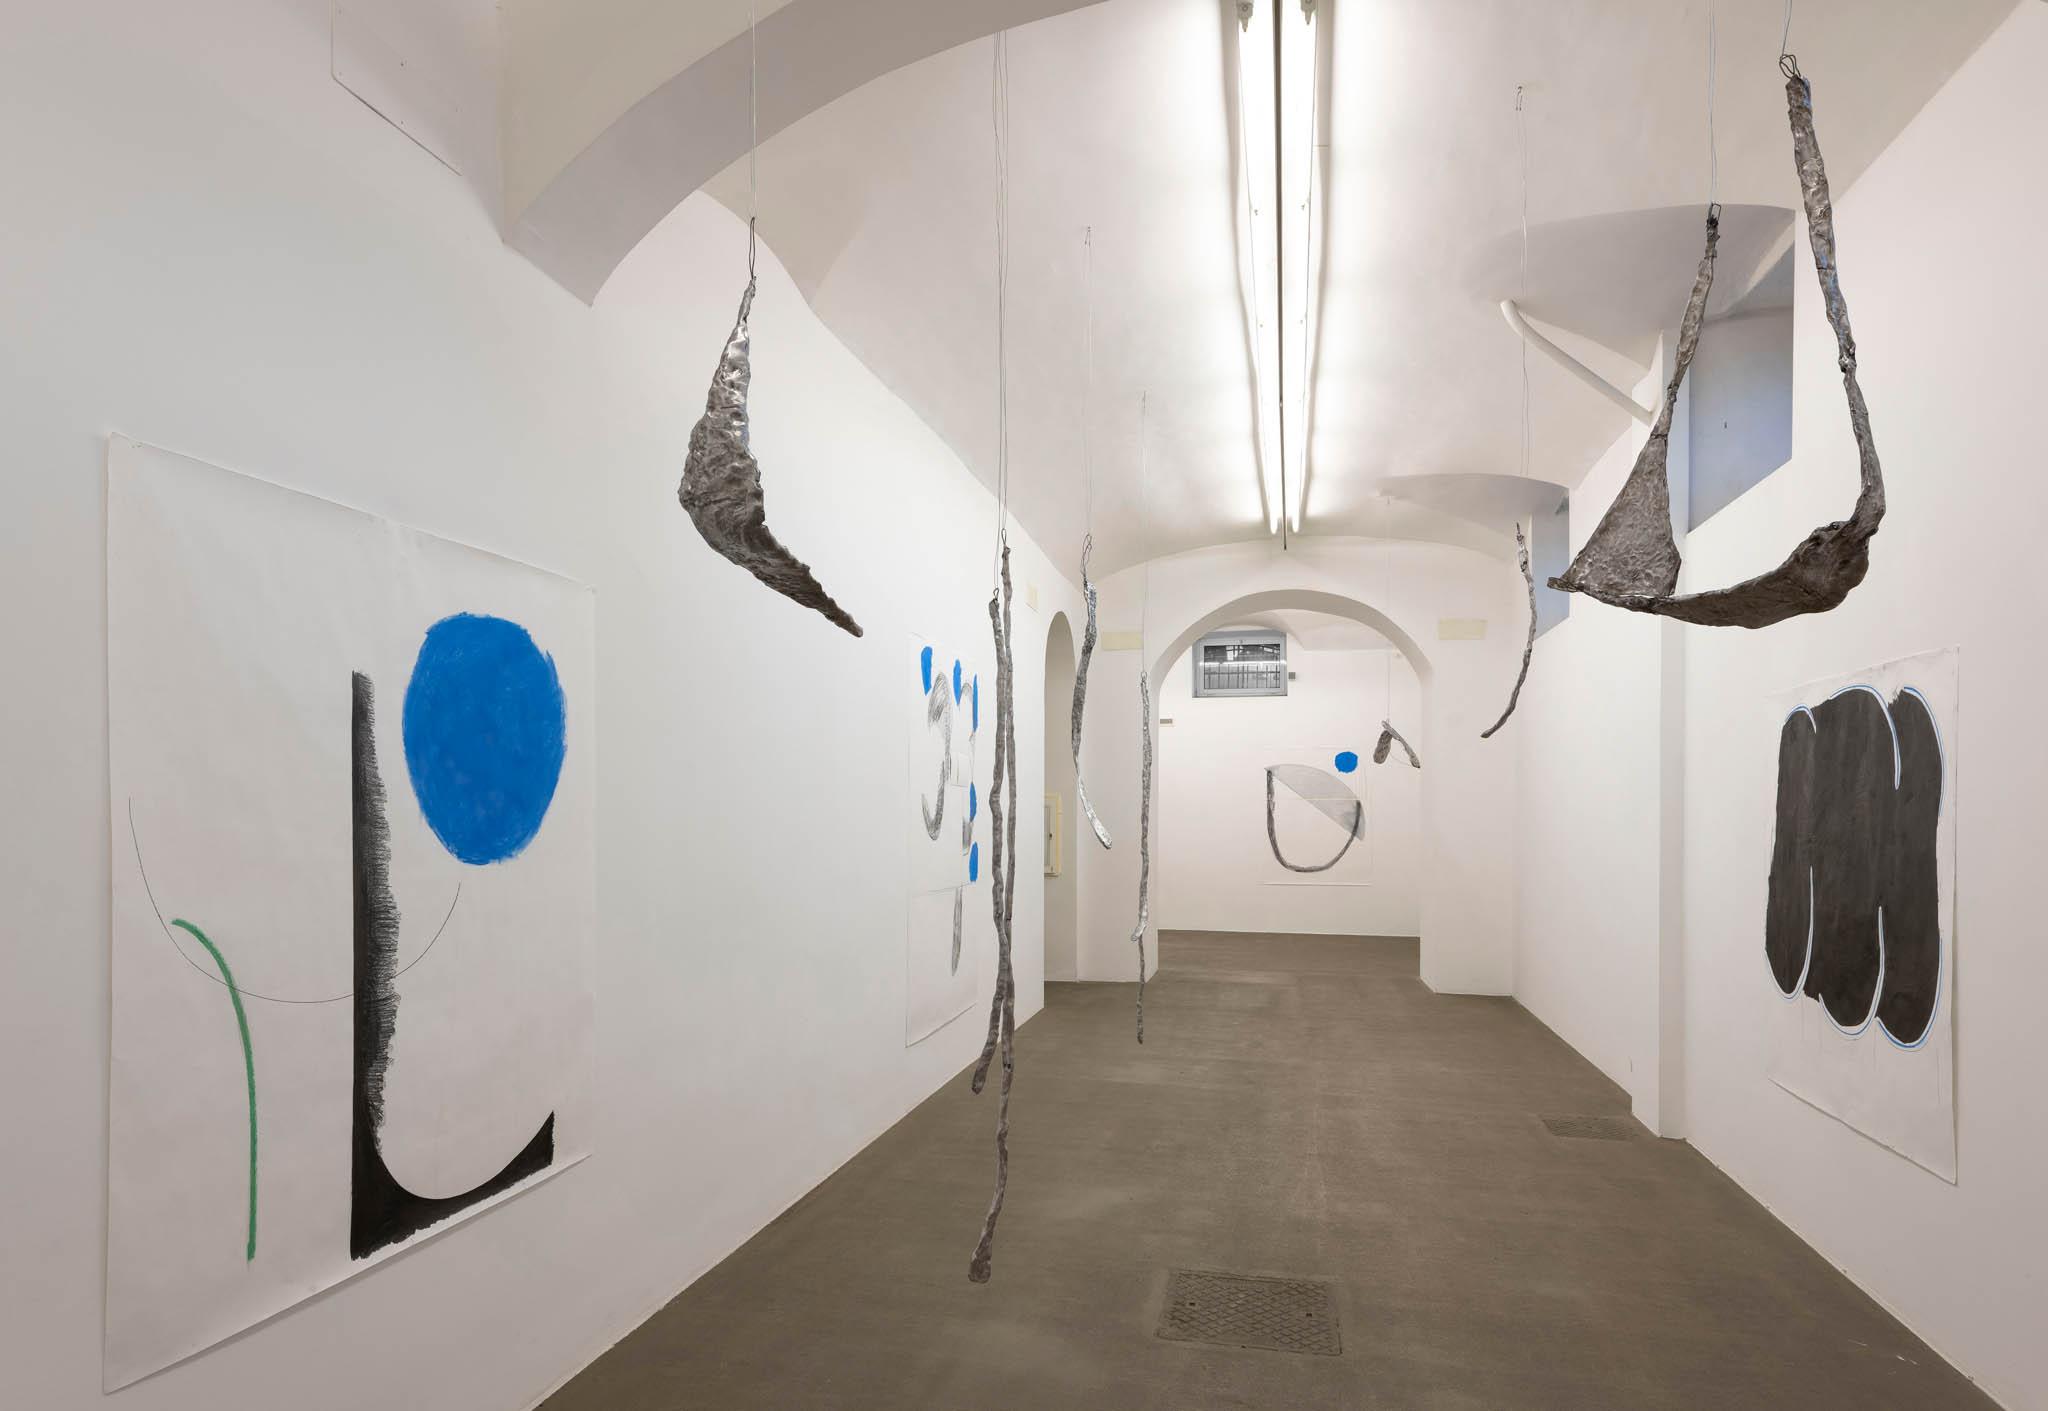 . Esther Kläs Room 2, 2019, 9 aluminium pieces, 4 drawings; Courtesy SpazioA, Pistoia; photo Giorgio Benni